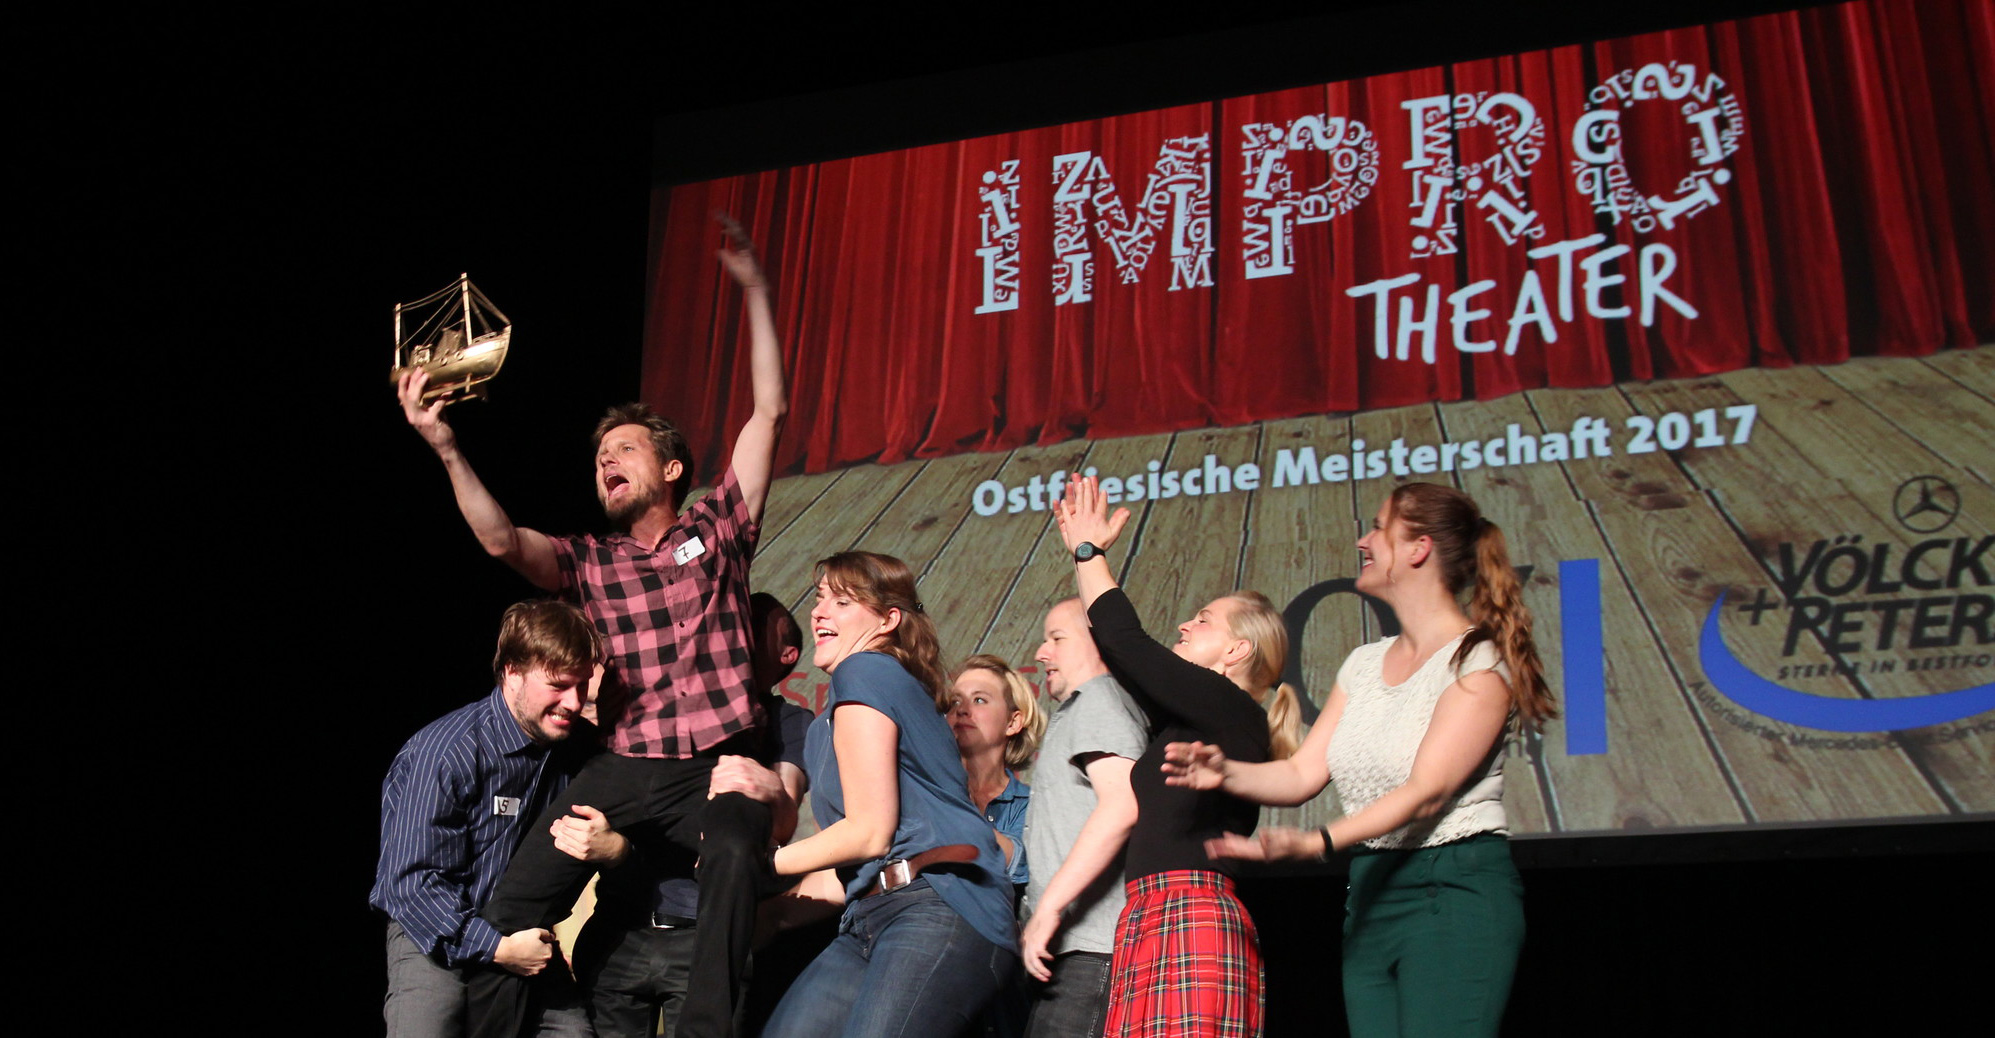 impro-theater-leer-foto-jonas-bothe